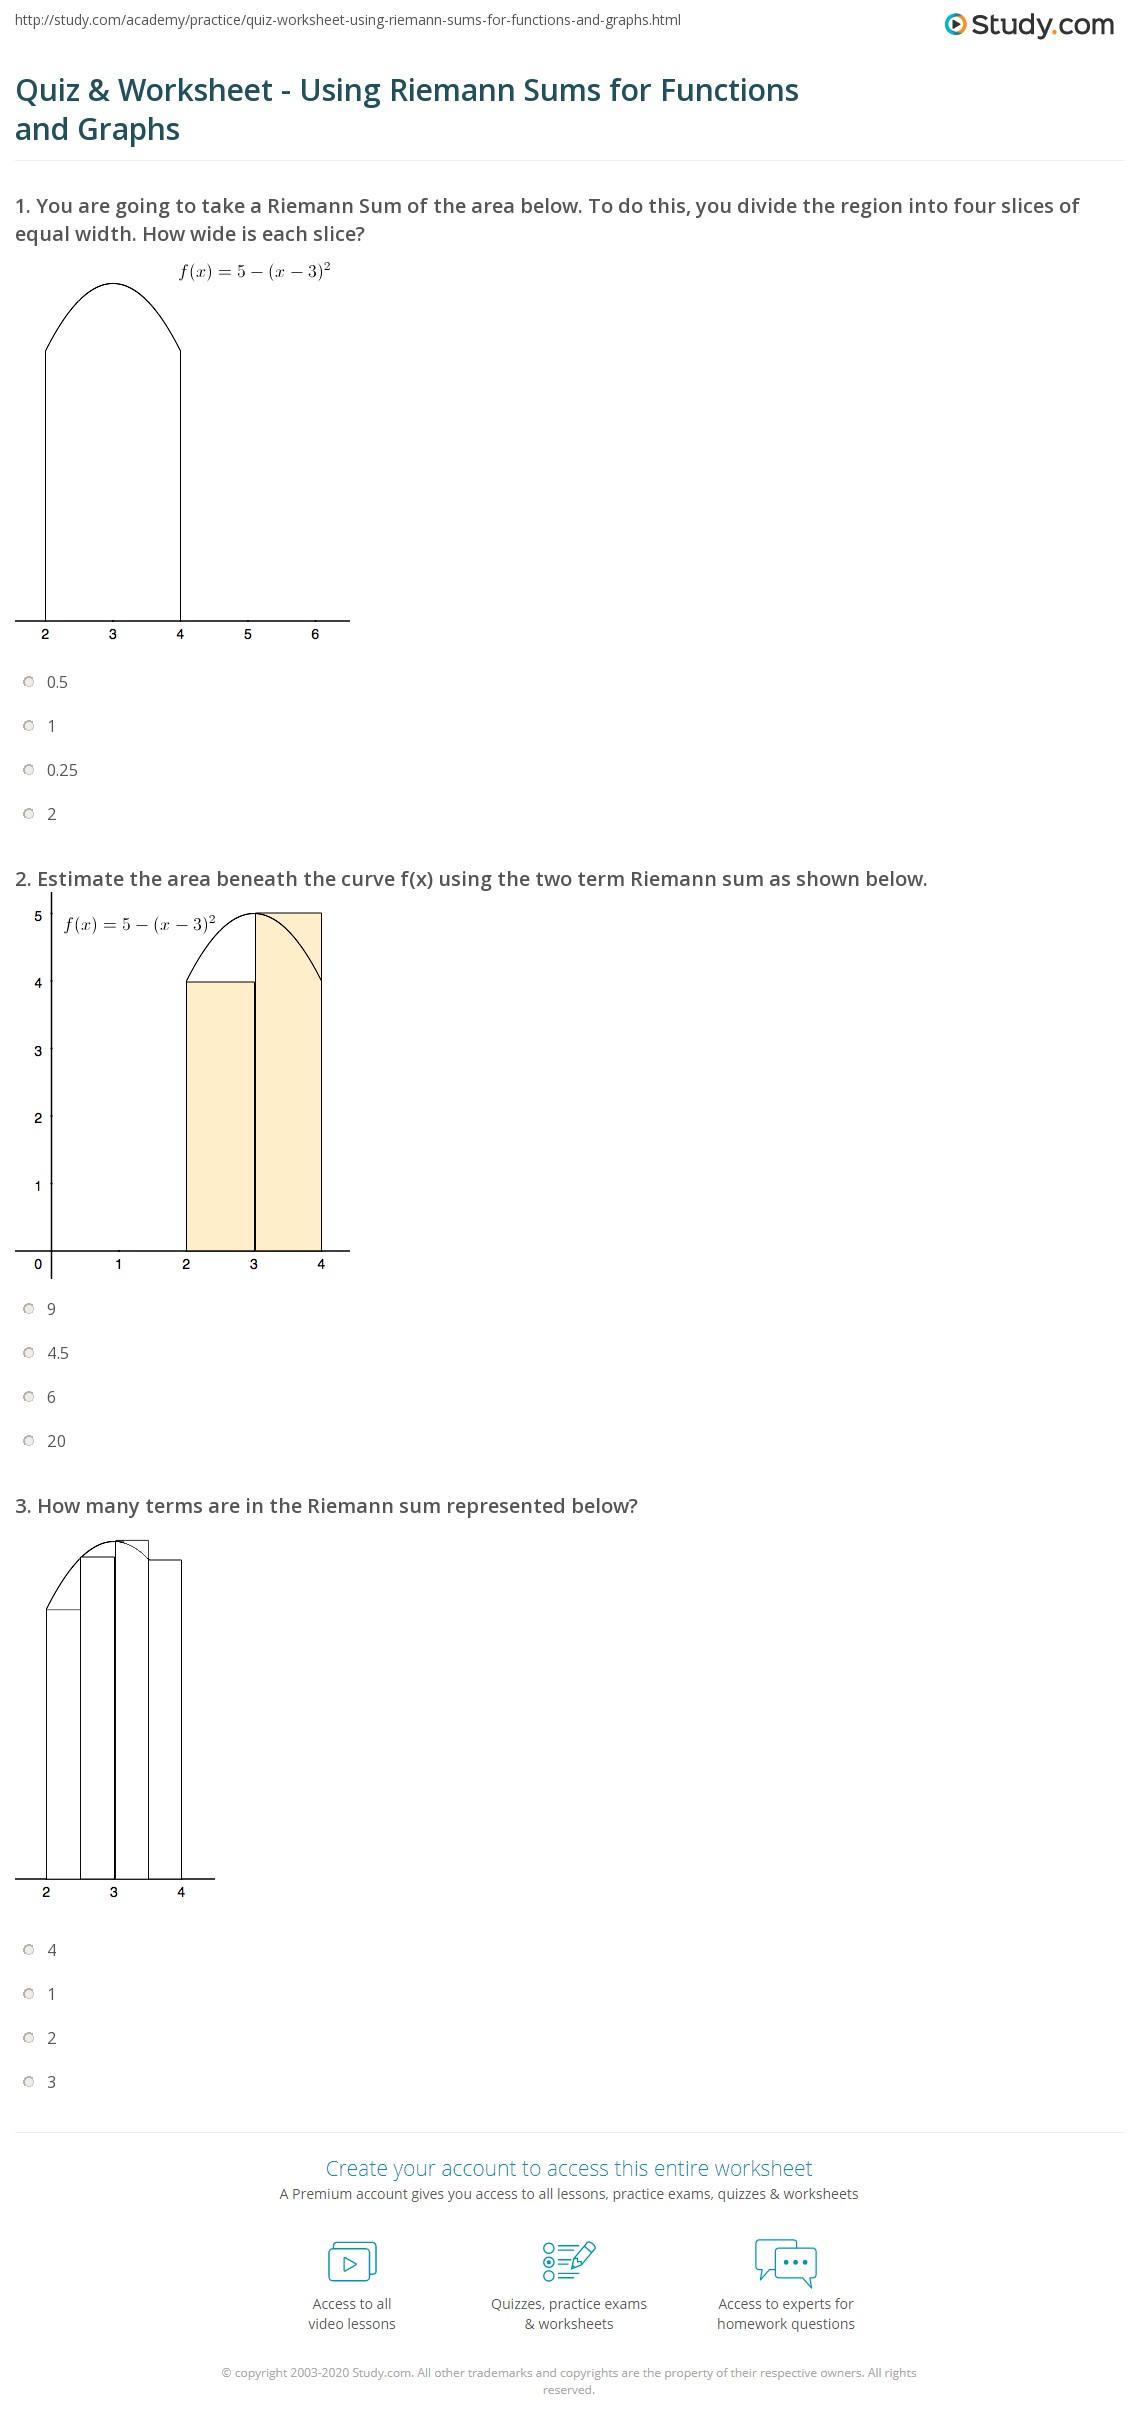 worksheet Riemann Sum Worksheet quiz worksheet using riemann sums for functions and graphs print how to use worksheet